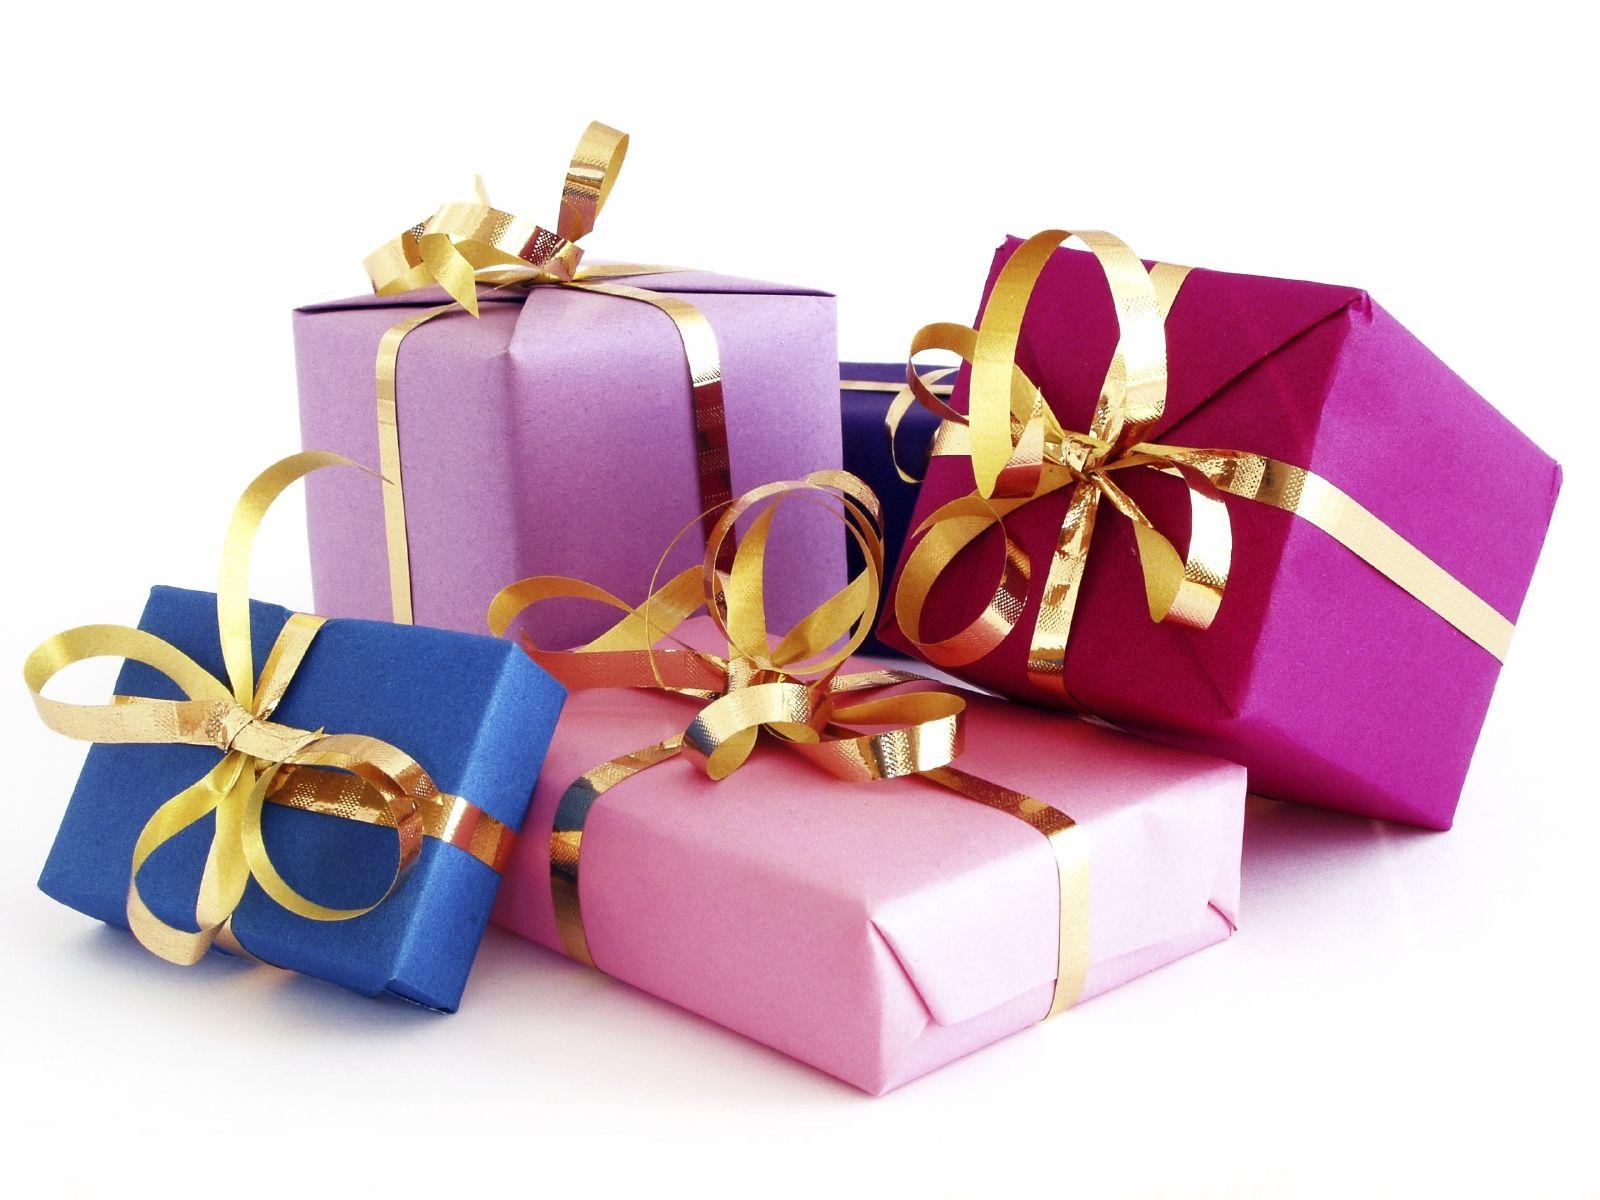 وصلت 16 الف لللللولليش Christmas-Gifts-for-Parents-2